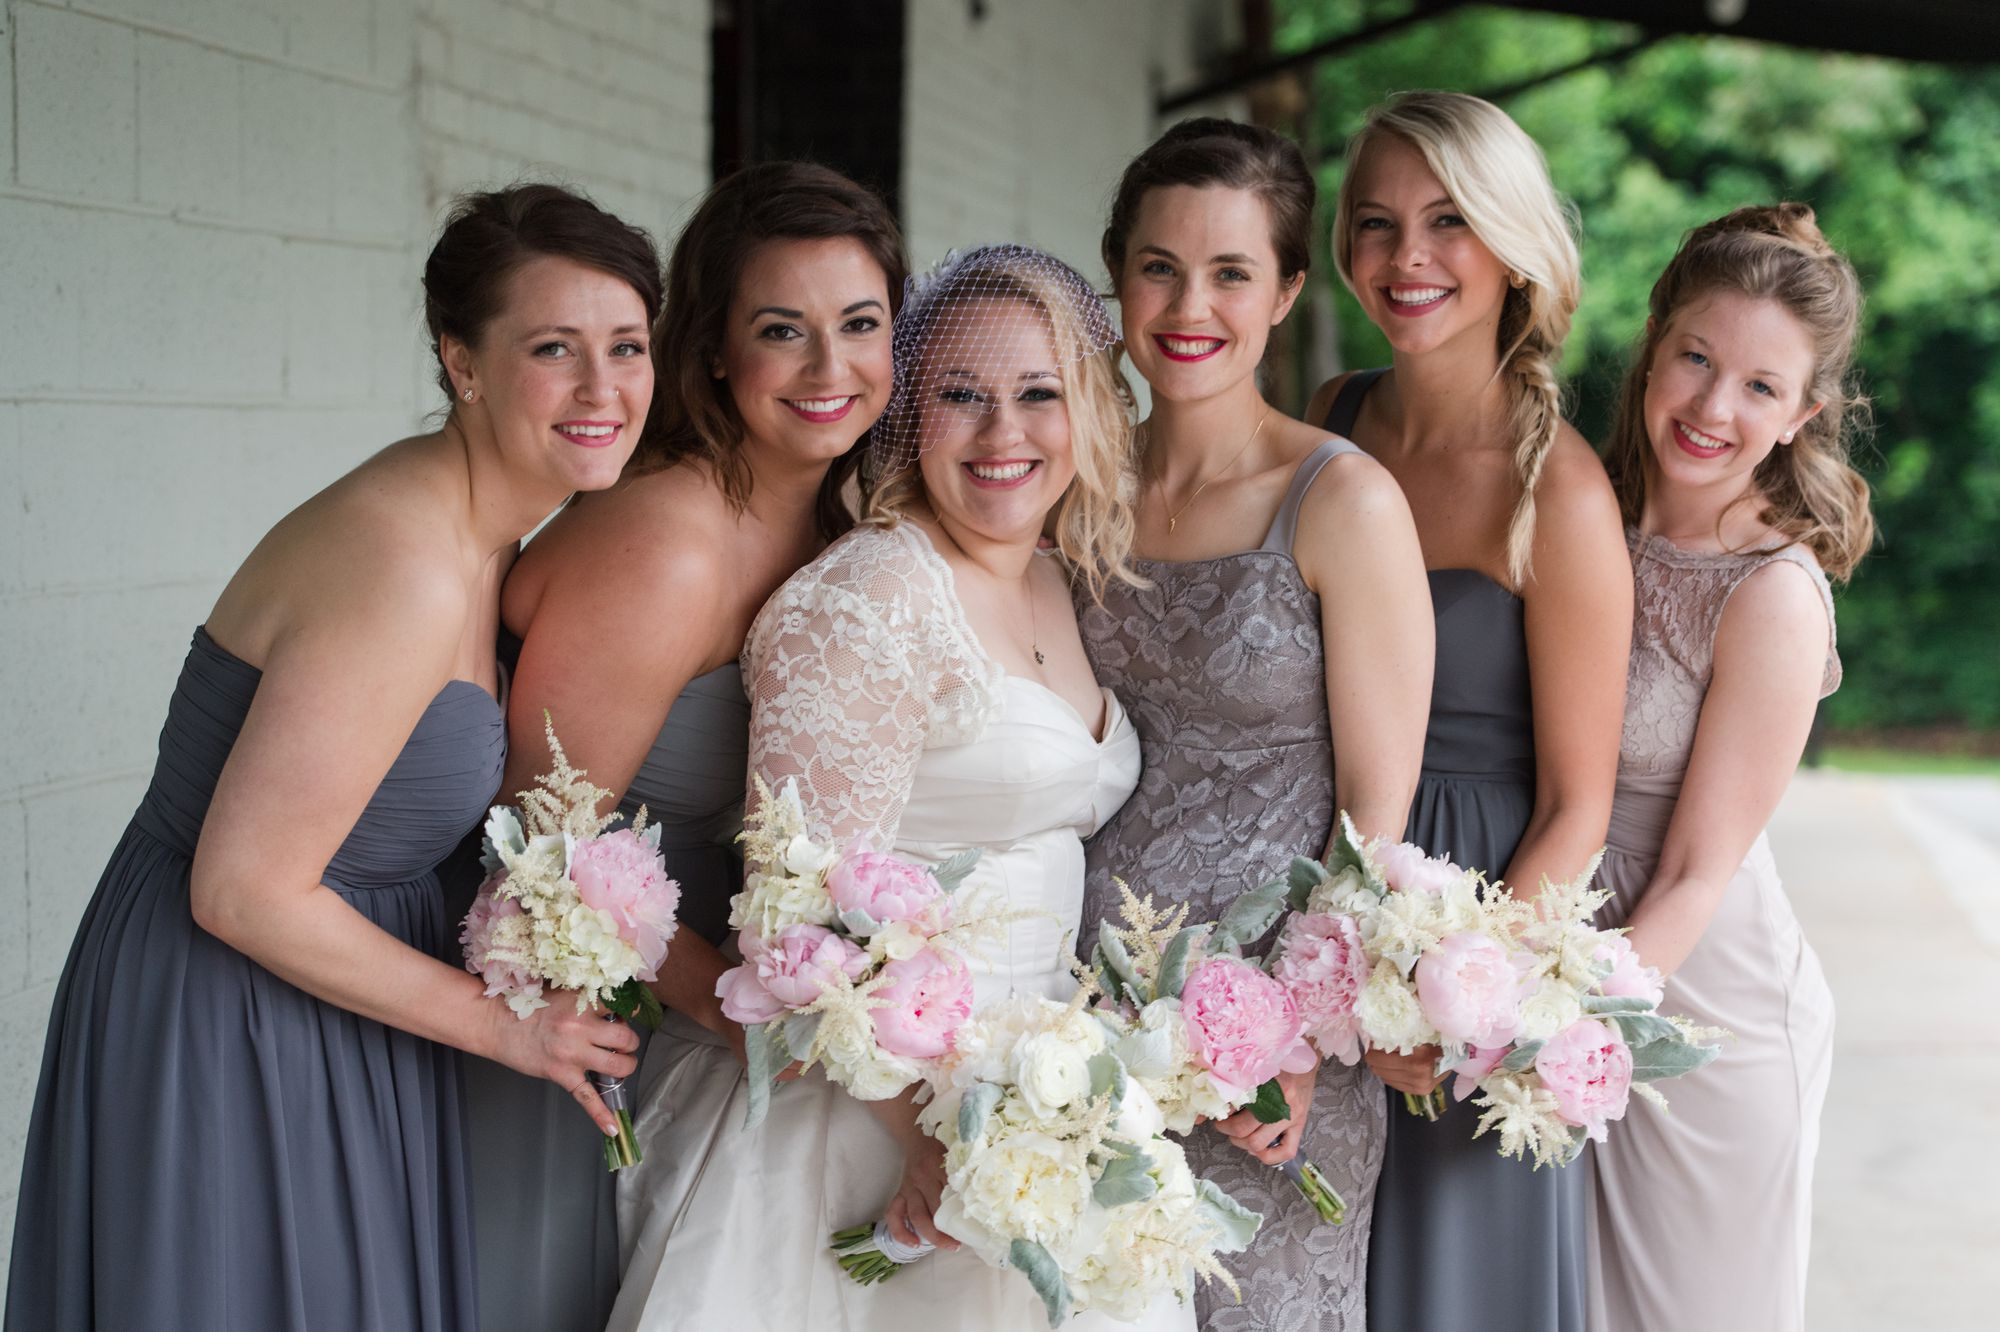 uptown-charlotte-warhouse-wedding 52